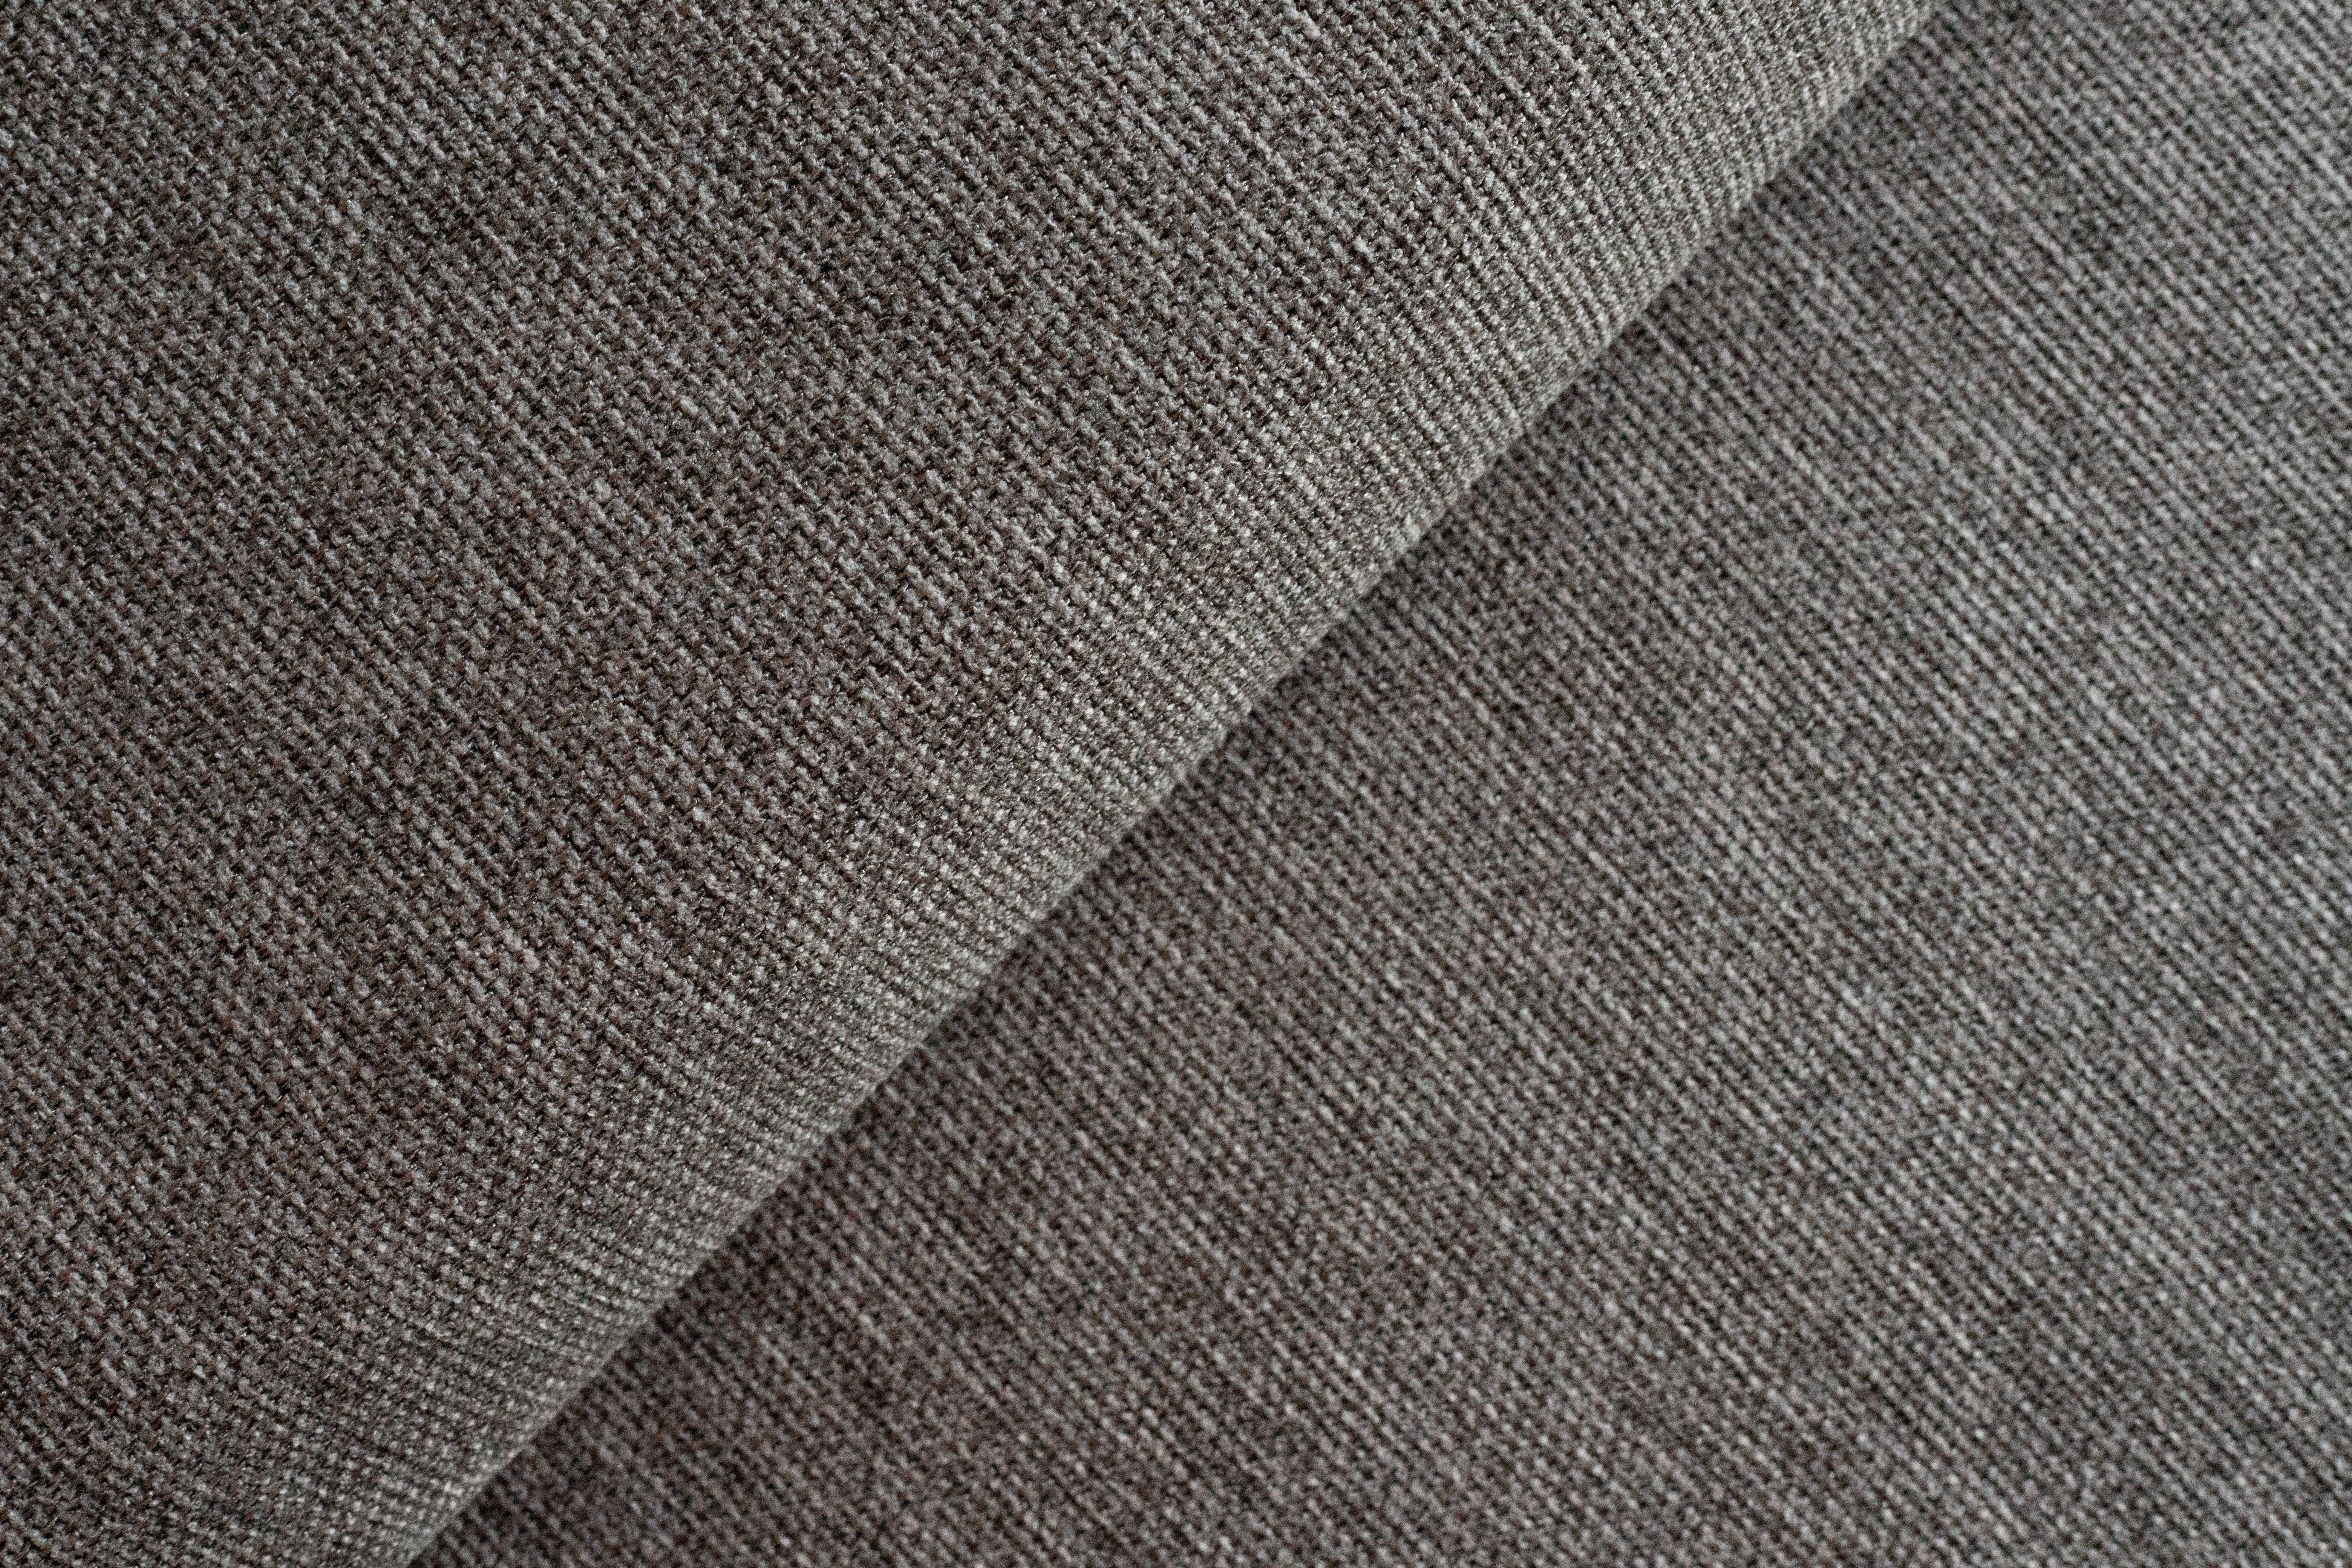 Potocki tkaniny: urban 3 300dpi